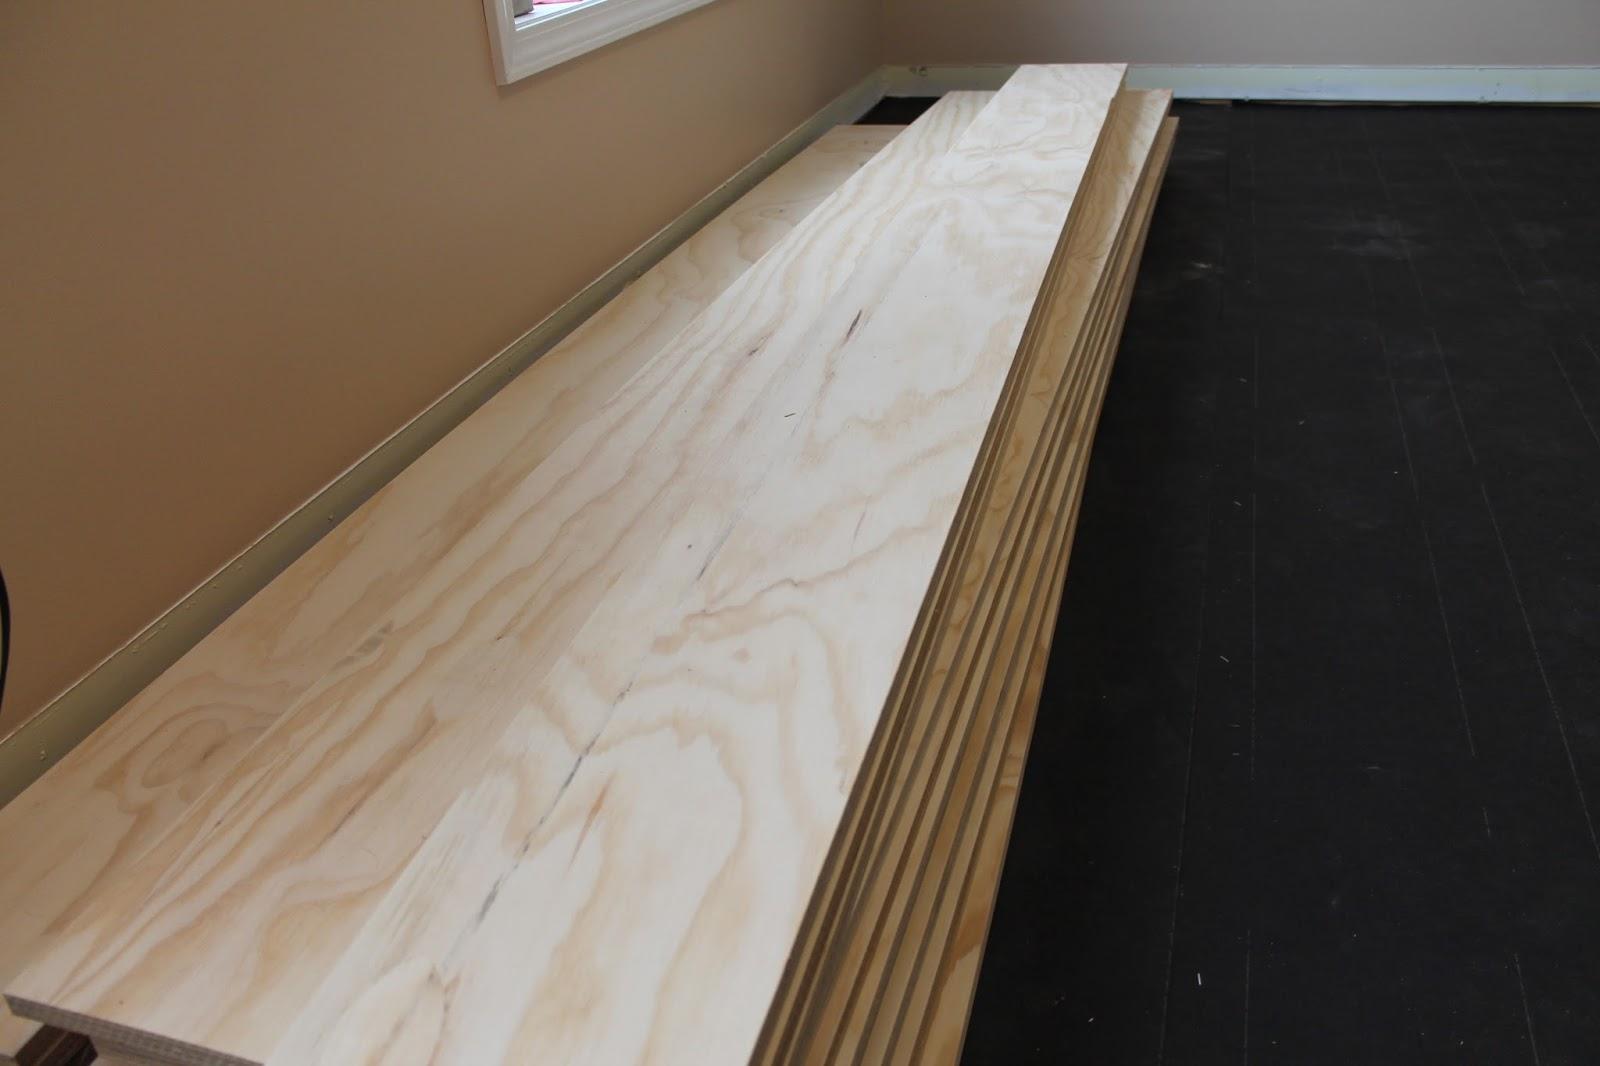 Diy plywood flooring an inexpensive hardwood alternative for Wood floor alternatives